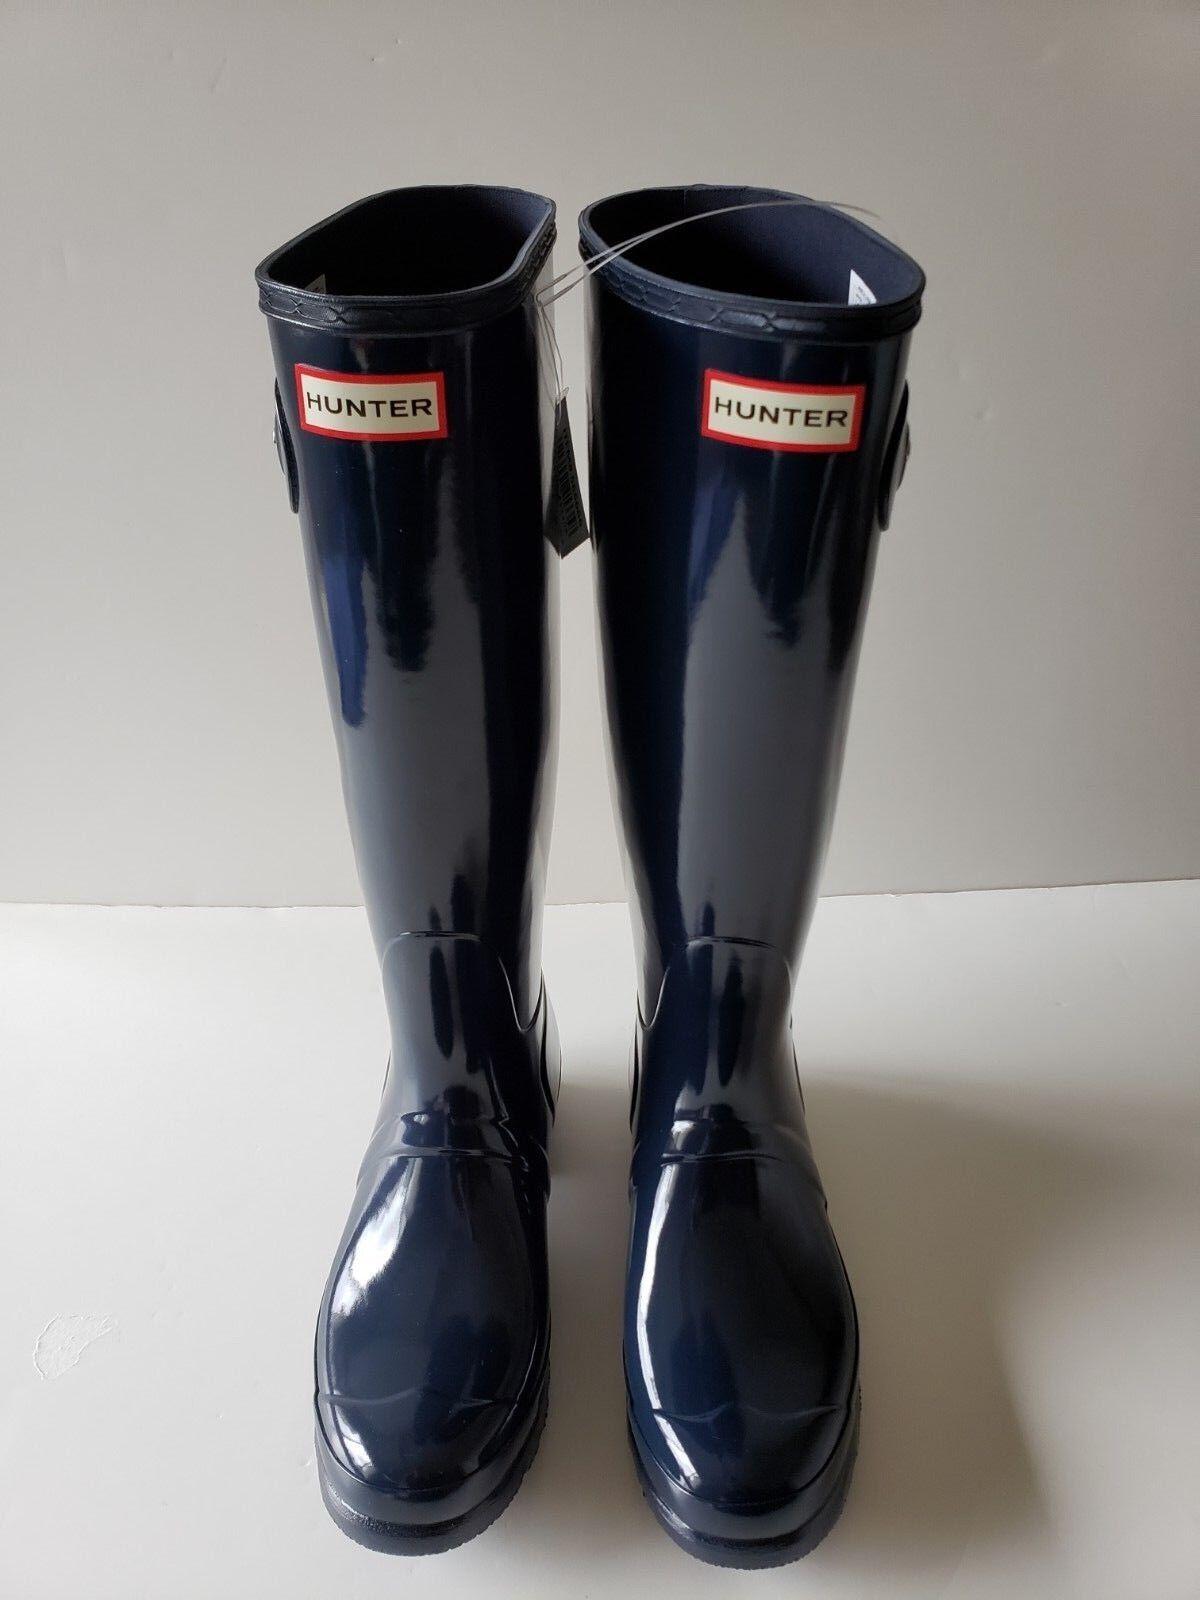 vendite online Hunter Donna  Original Tall Knee-High Rubber Rain avvio Gloss Gloss Gloss Navy Dimensione 10  varie dimensioni